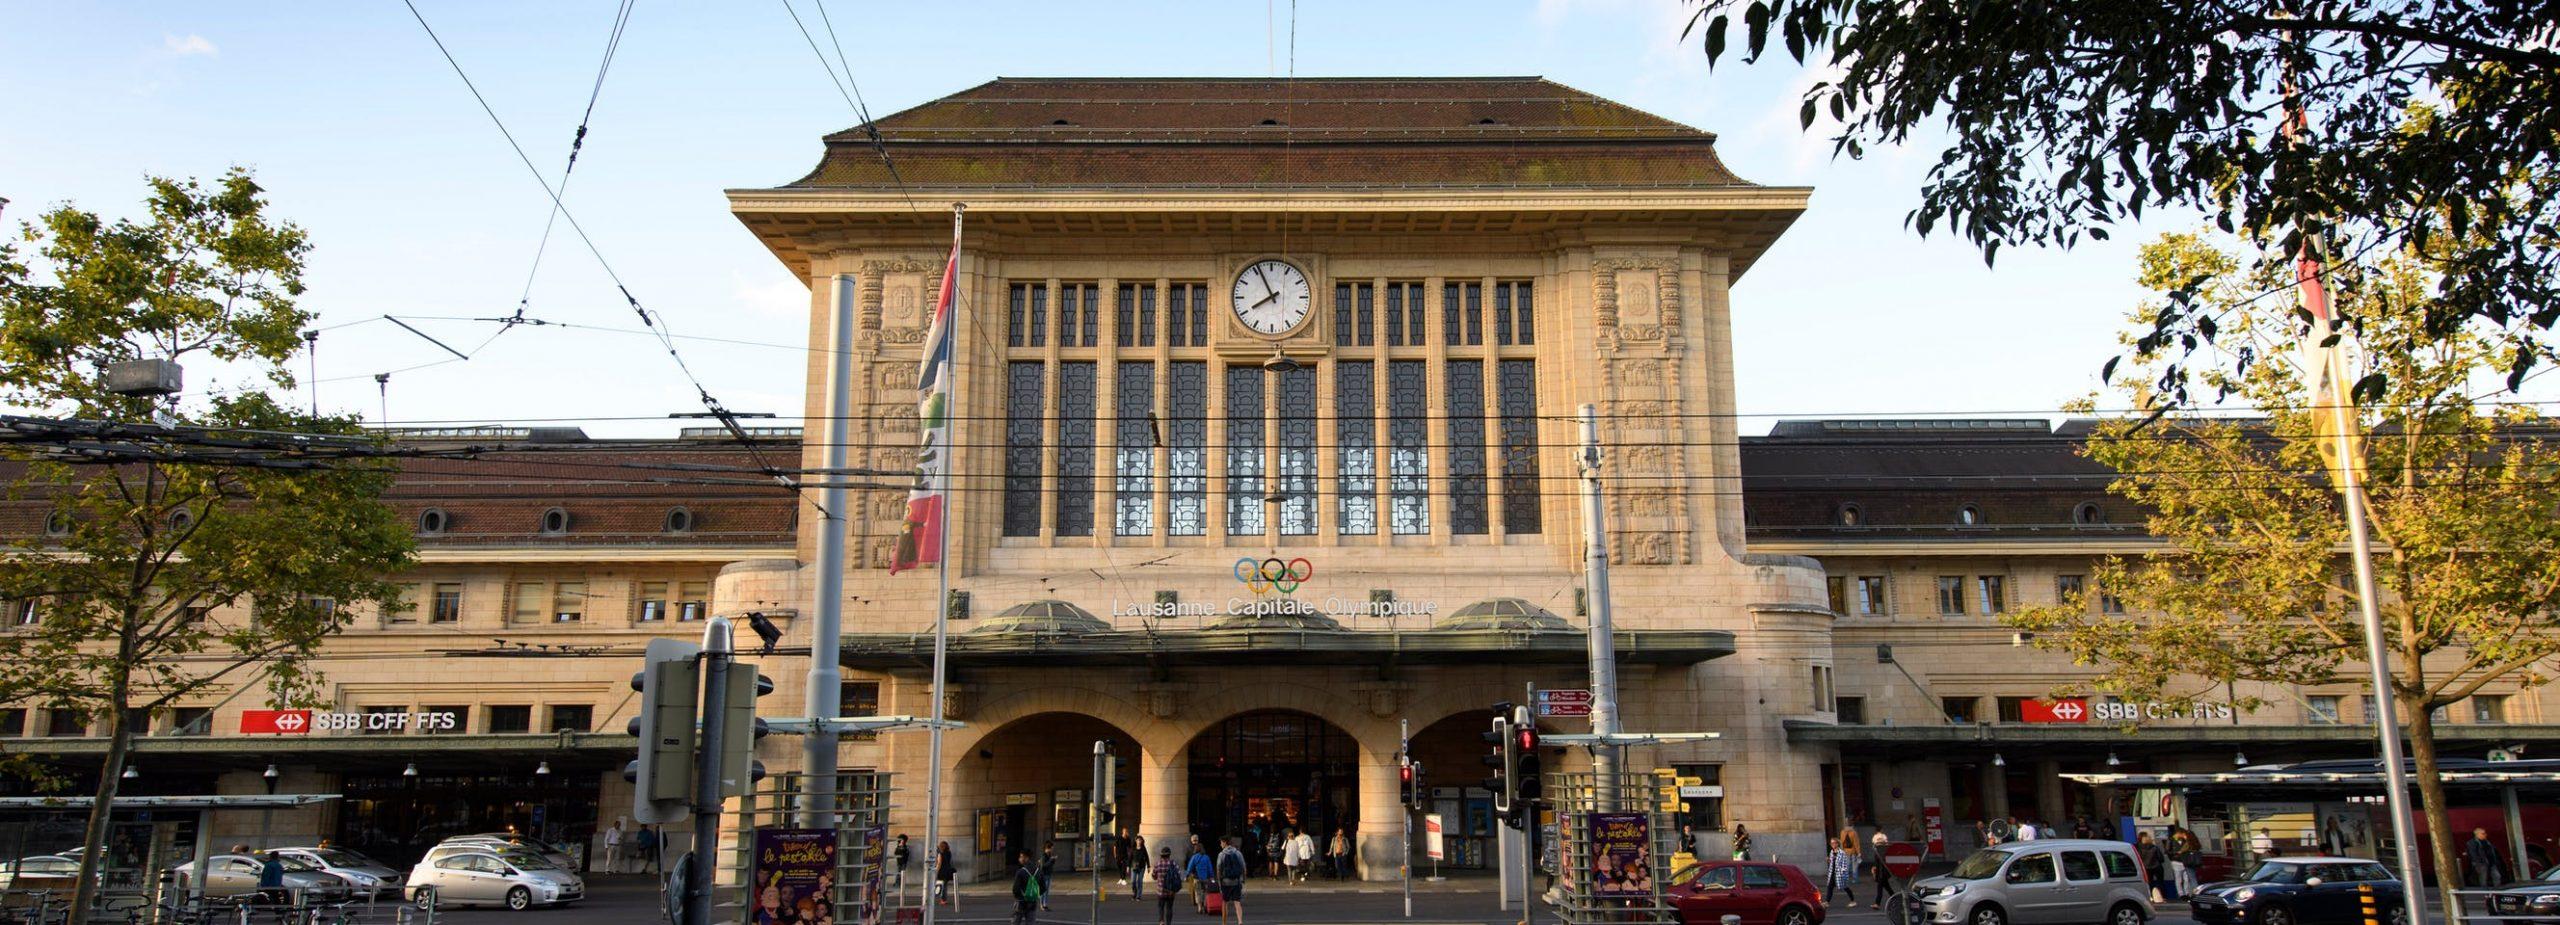 Gare de Lausanne (c)SBB